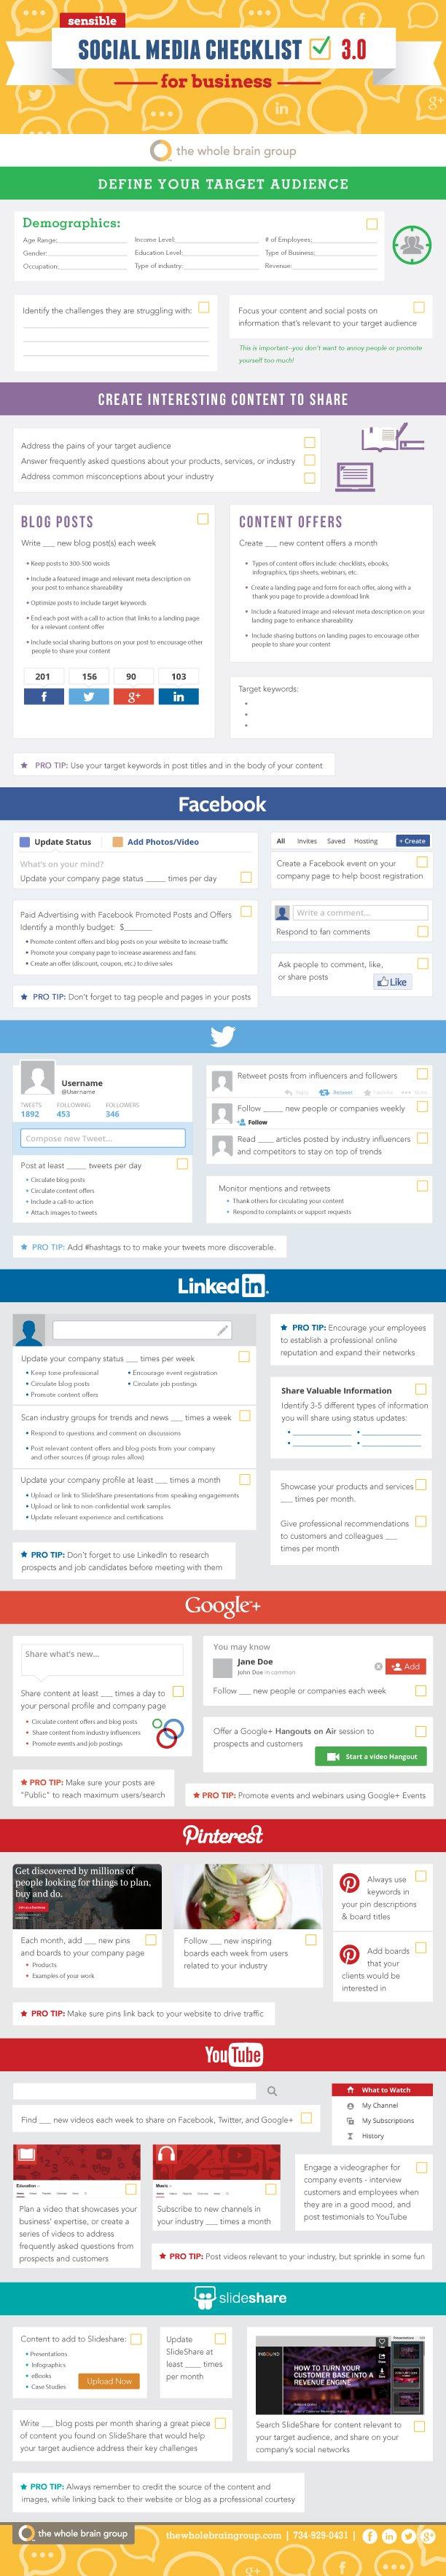 A Sensible Social Media Checklist For Business